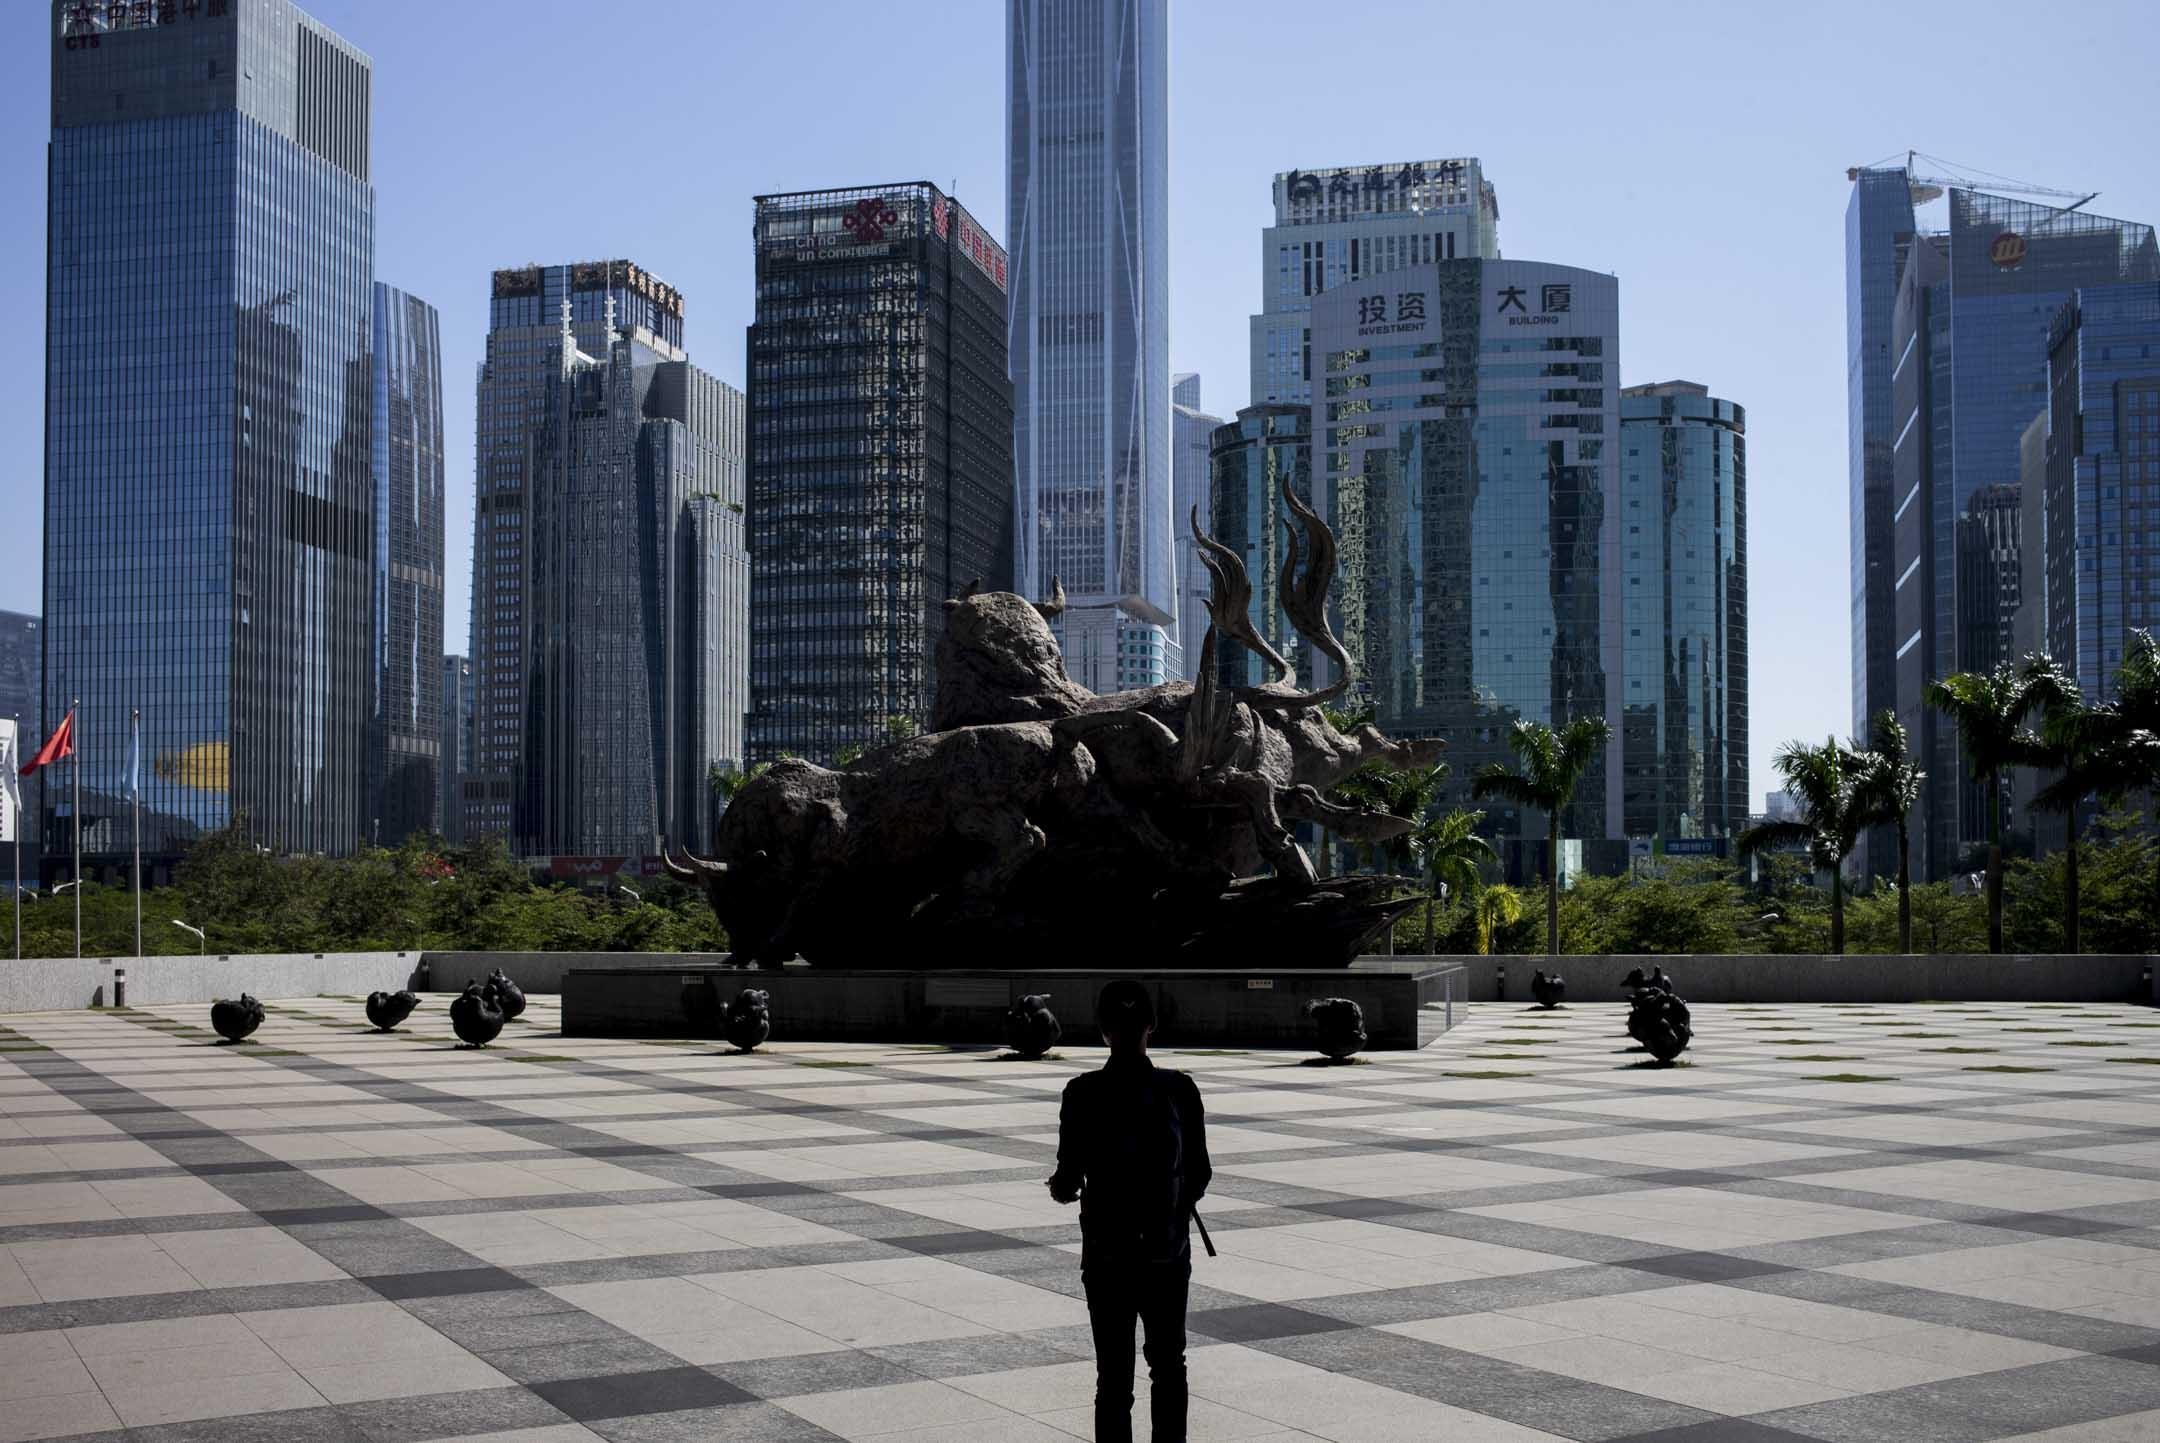 P2P平台大量爆雷,是2018年中國經濟轉折的代表性事件,是中國政府長期以政治思維主導、干預市場經濟下的「正常能量釋放」。 攝:林振東/端傳媒